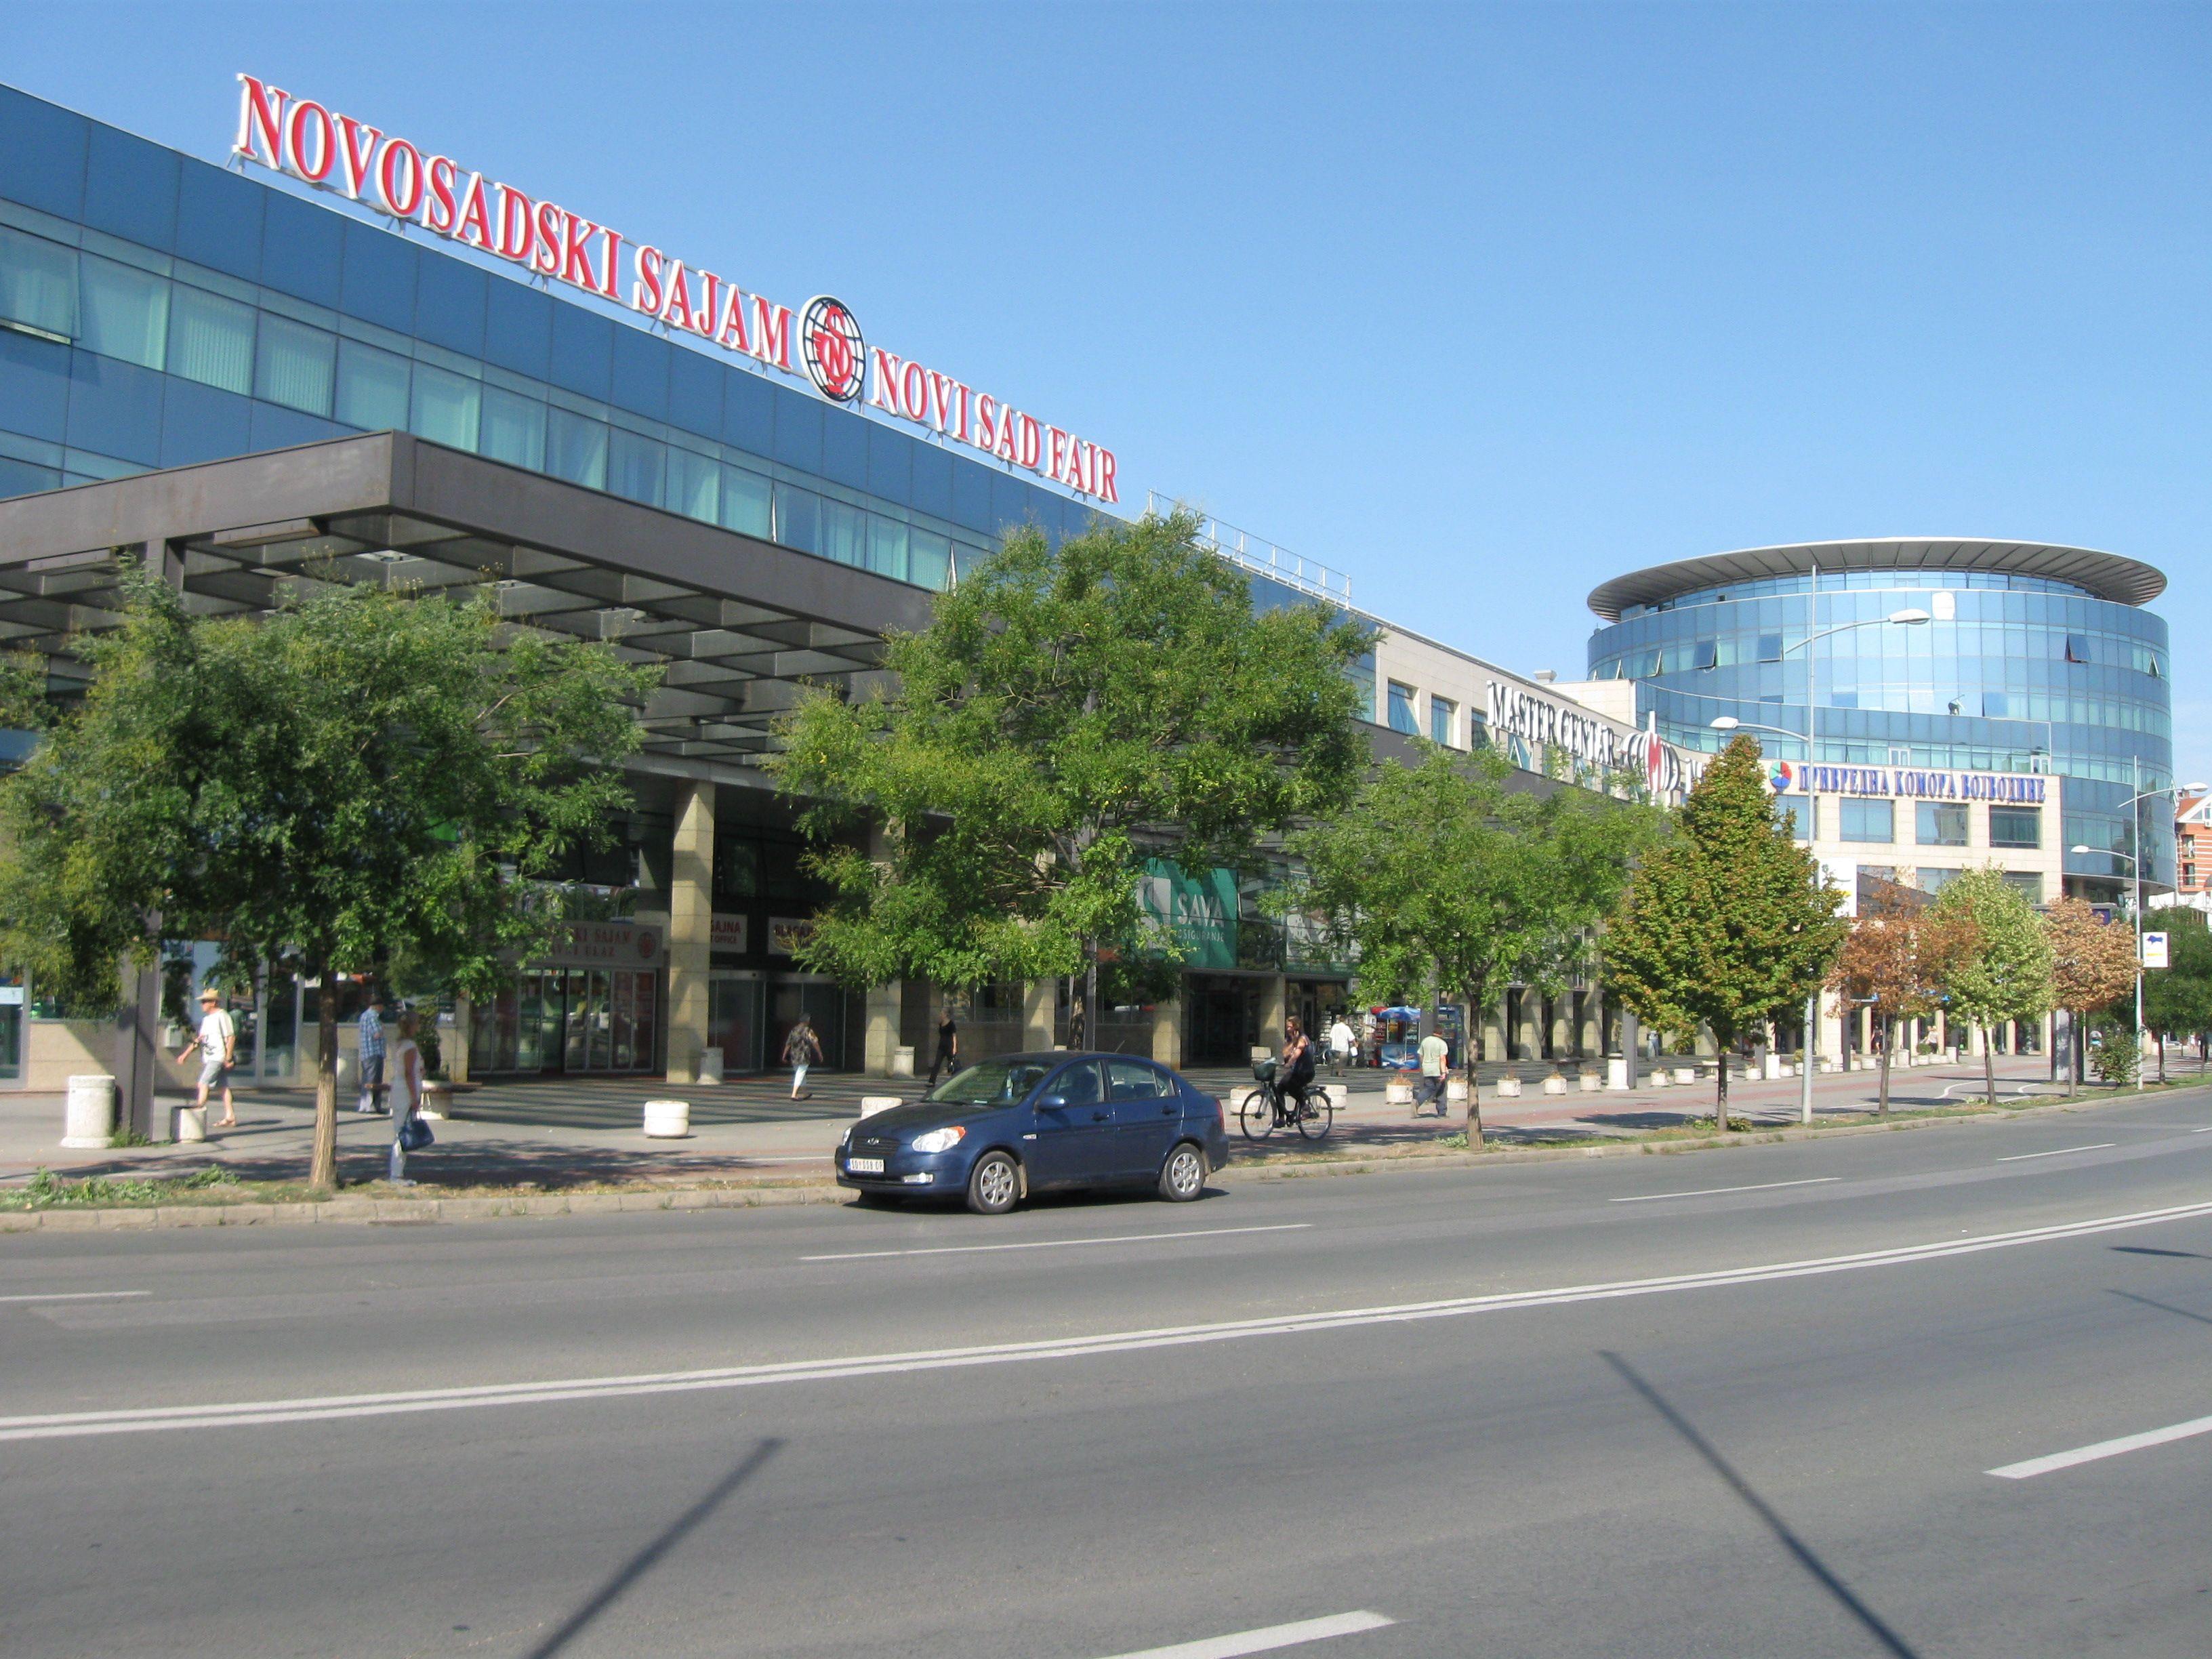 Pin on Novi Sad Vojvodina Serbia